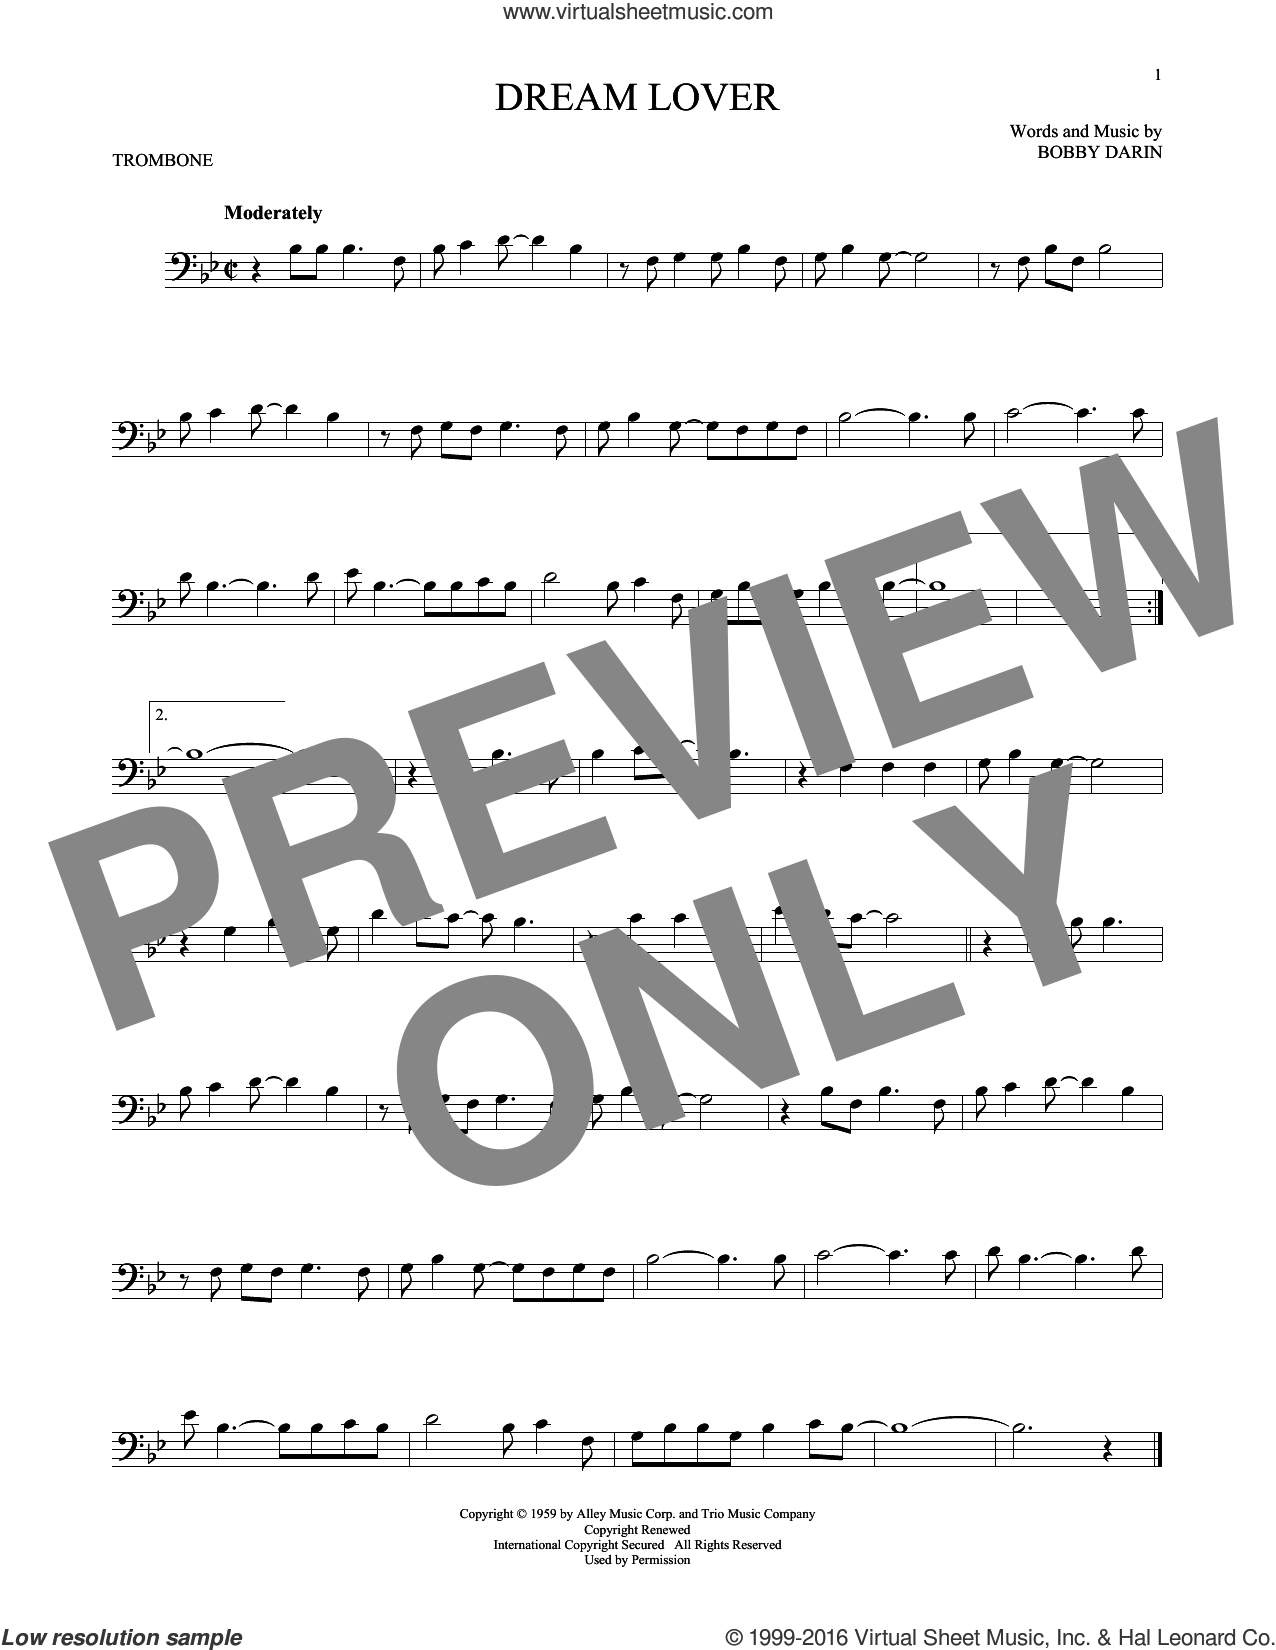 Dream Lover sheet music for trombone solo by Bobby Darin and Manhattan Transfer, intermediate skill level